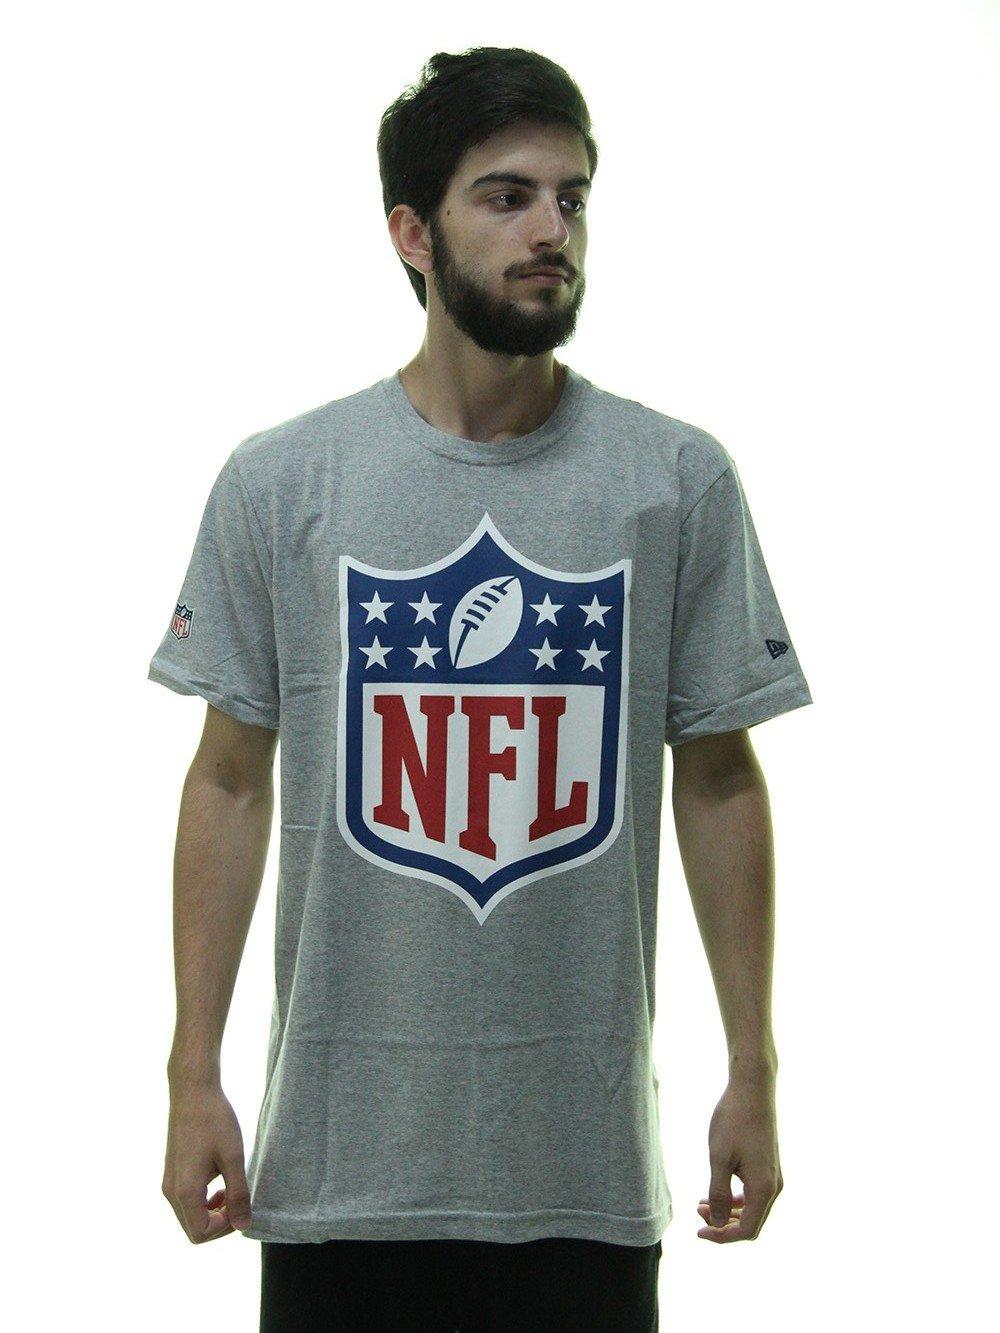 Camiseta Masculina New Era Logo NFL Estampada Manga Curta - Cinza Mesclado  ... 781fe730eb1